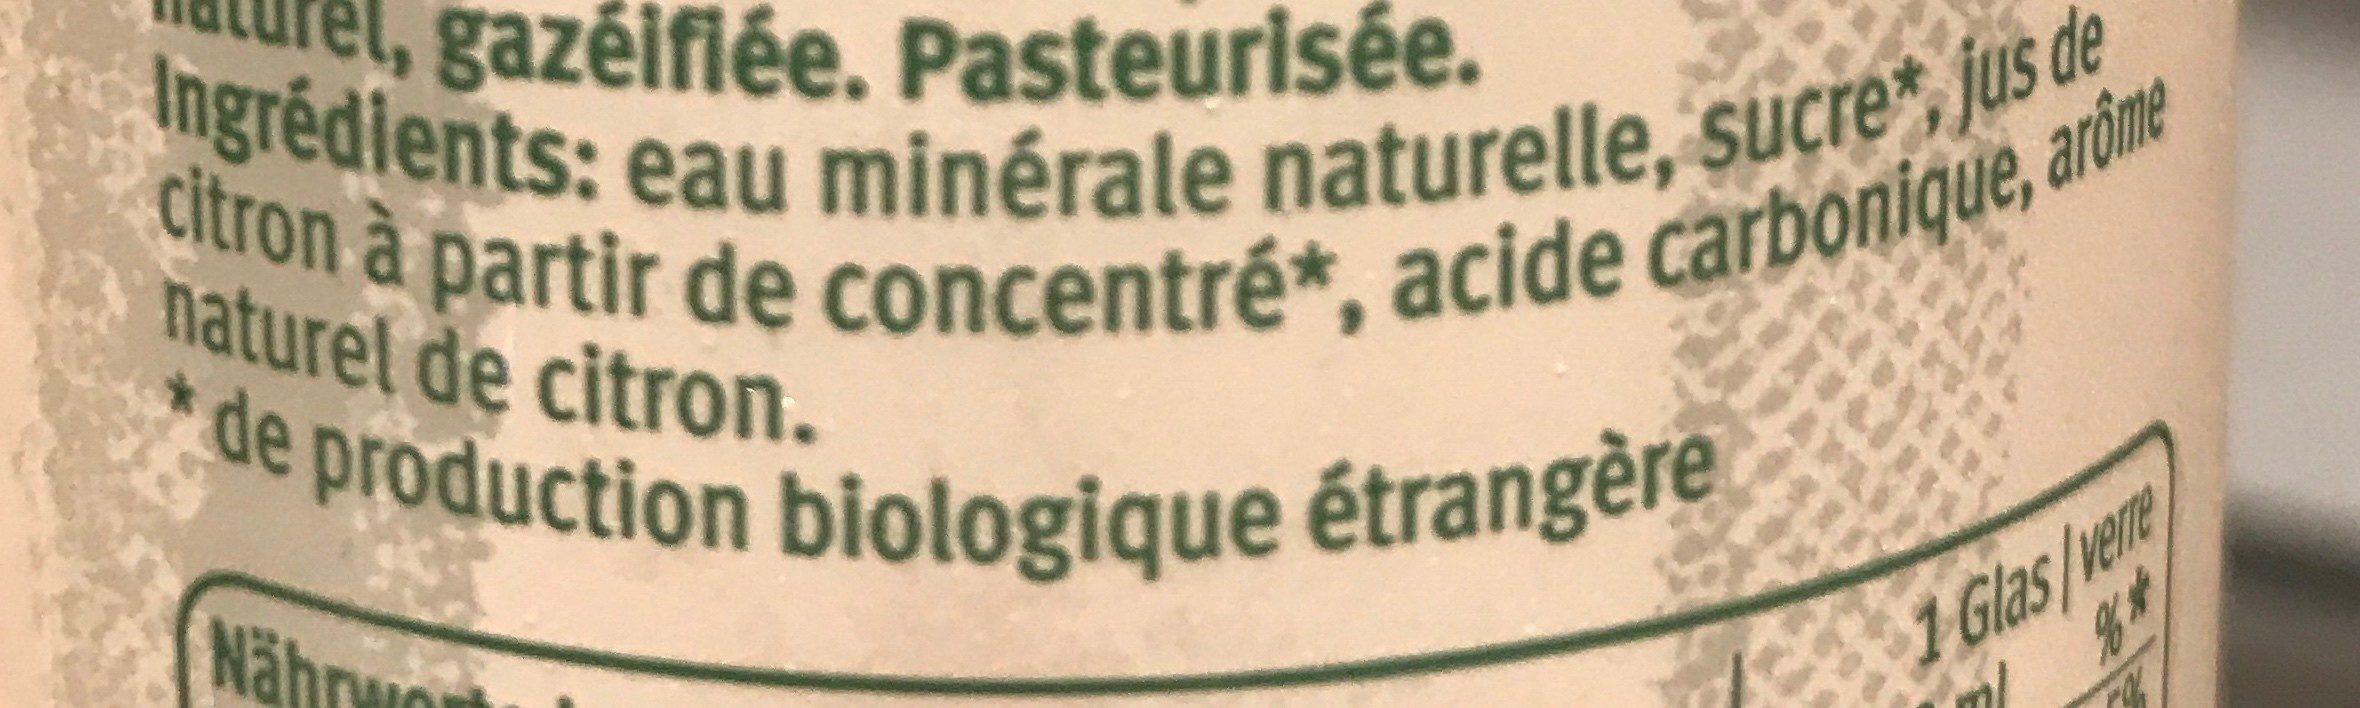 Liminade citron - Ingredients - fr